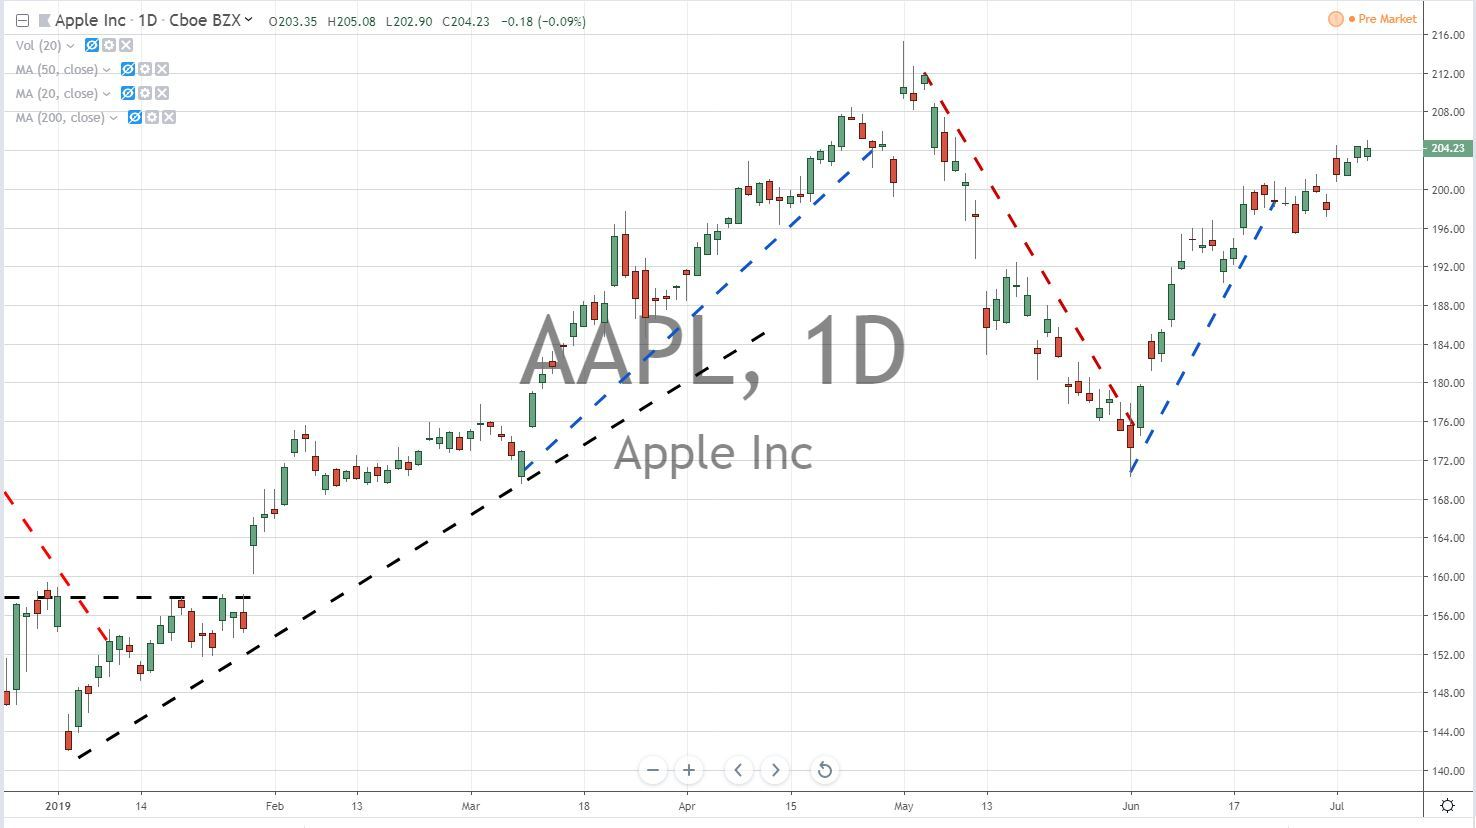 Apple Inc AAPL Stock Chart 7-8-19